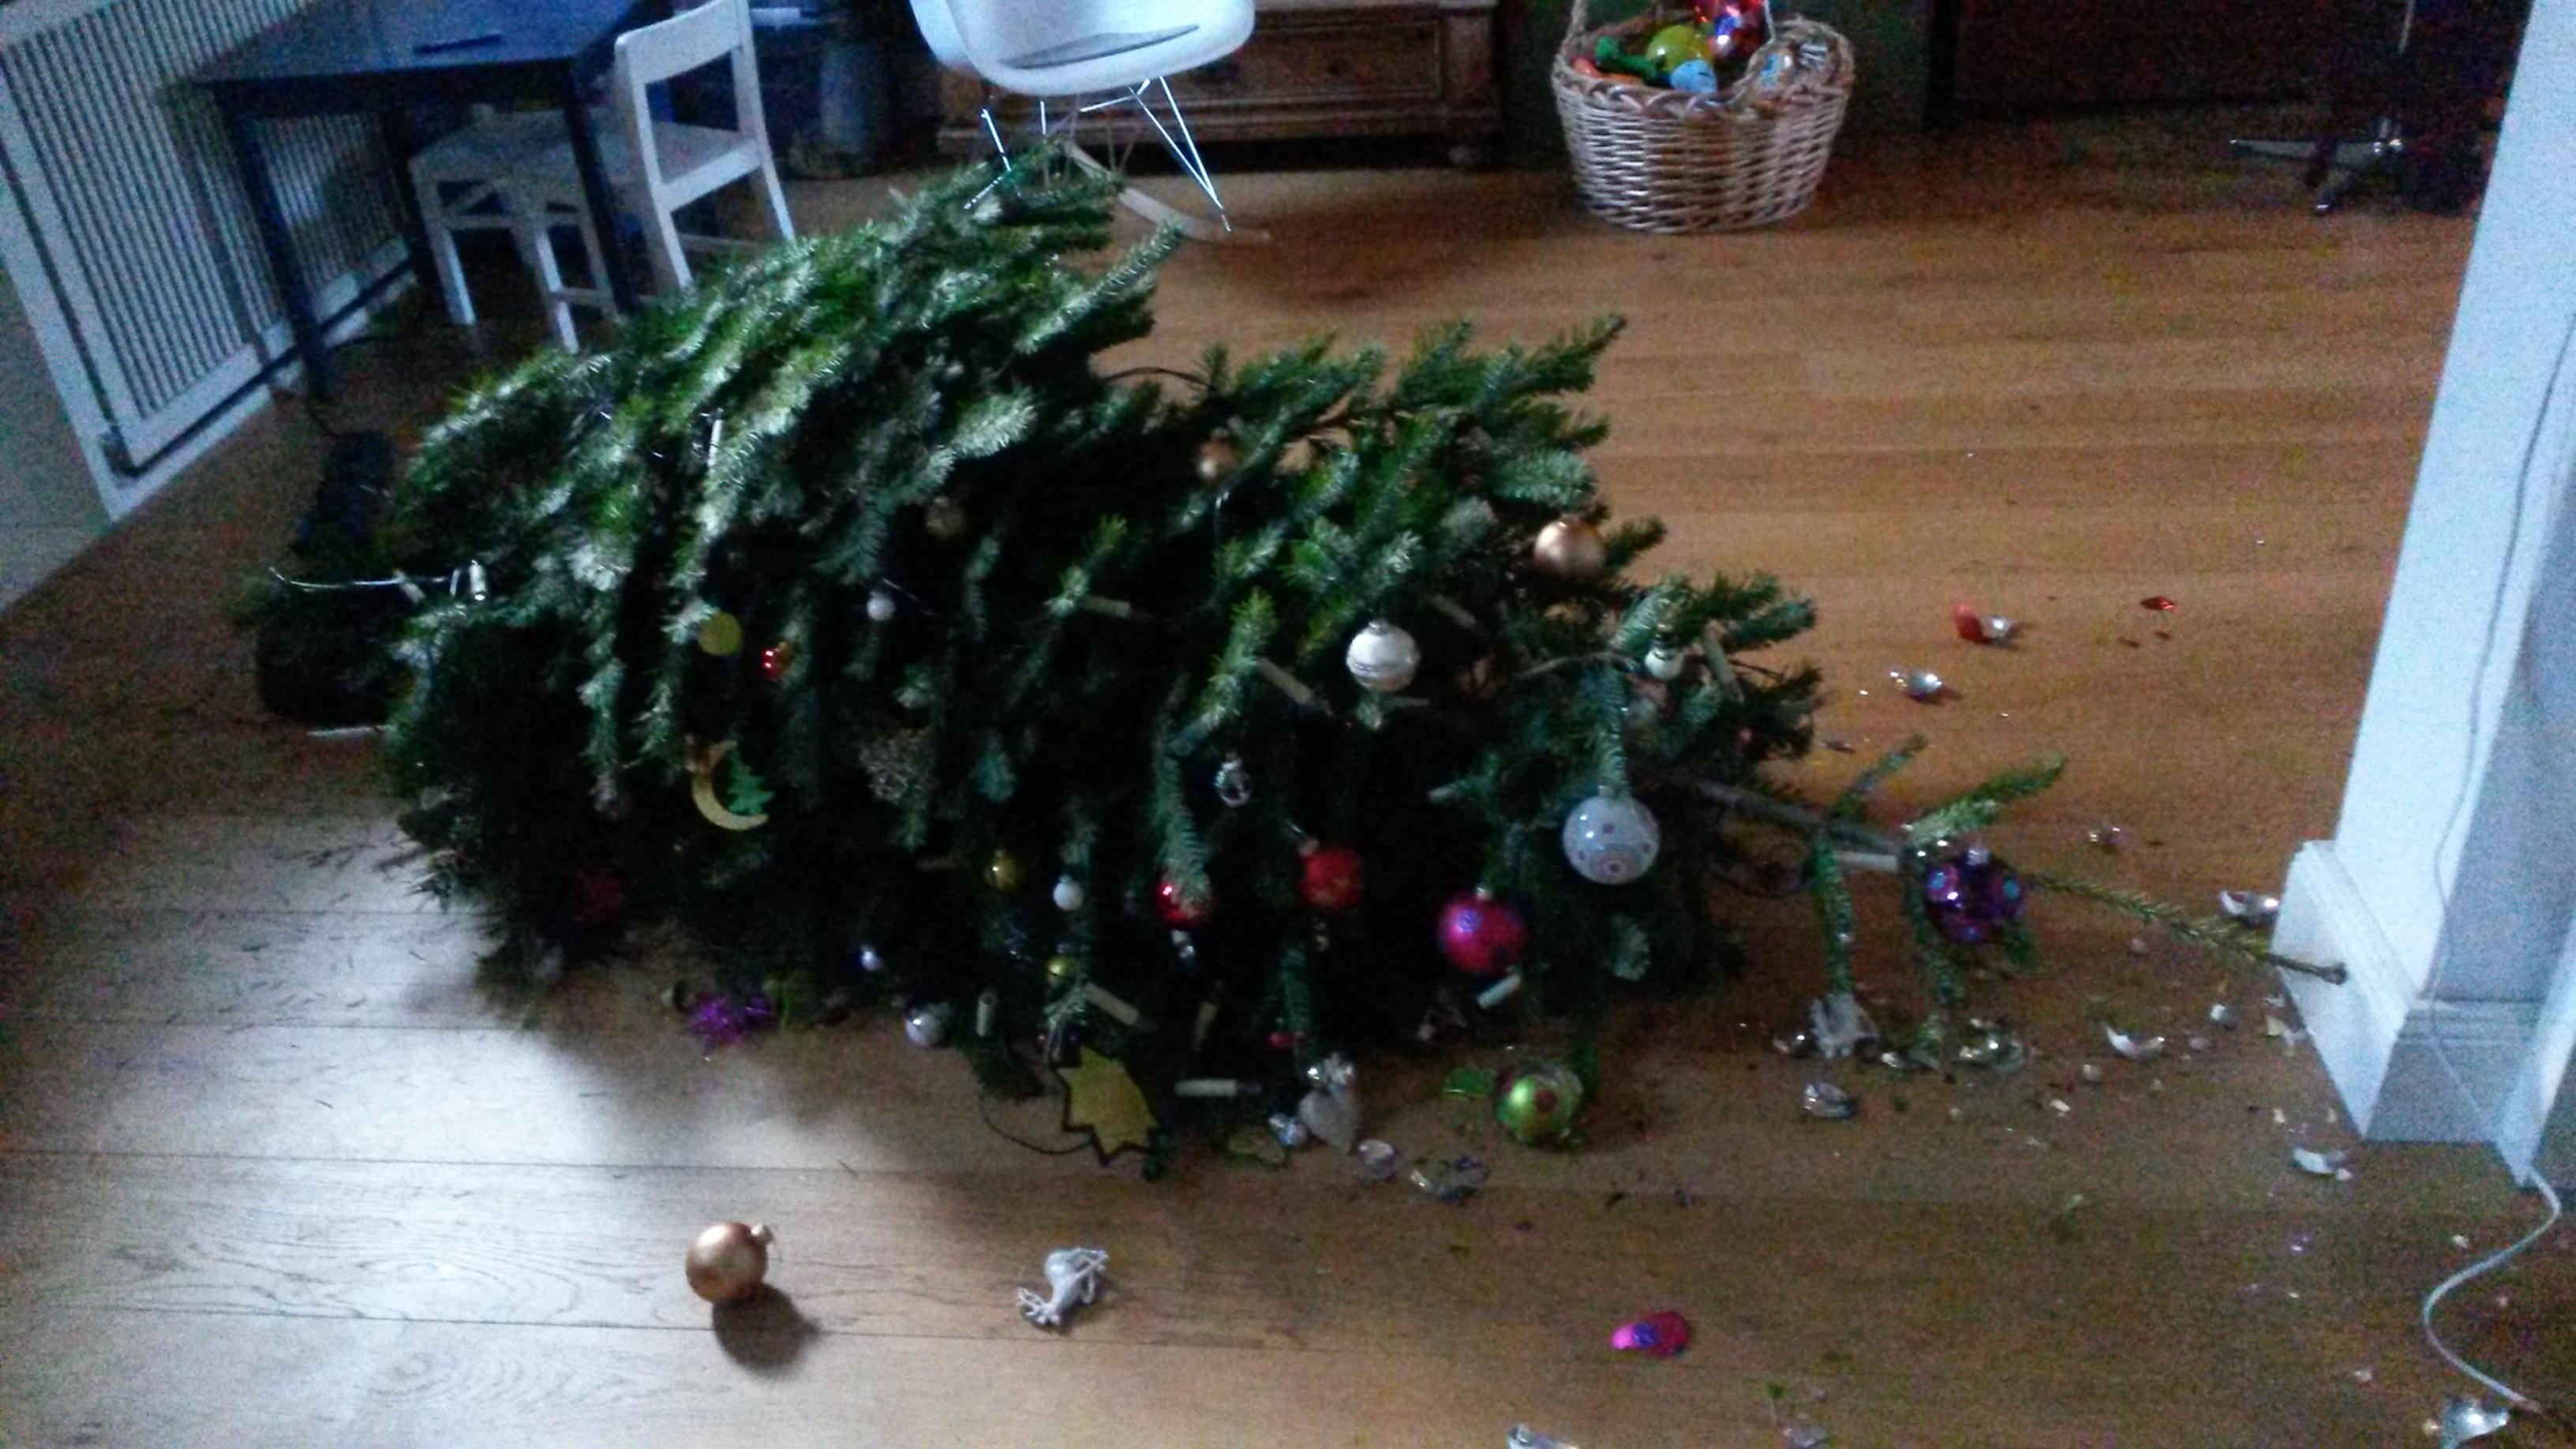 File:Broken christmastree.jpg - Wikimedia Commons